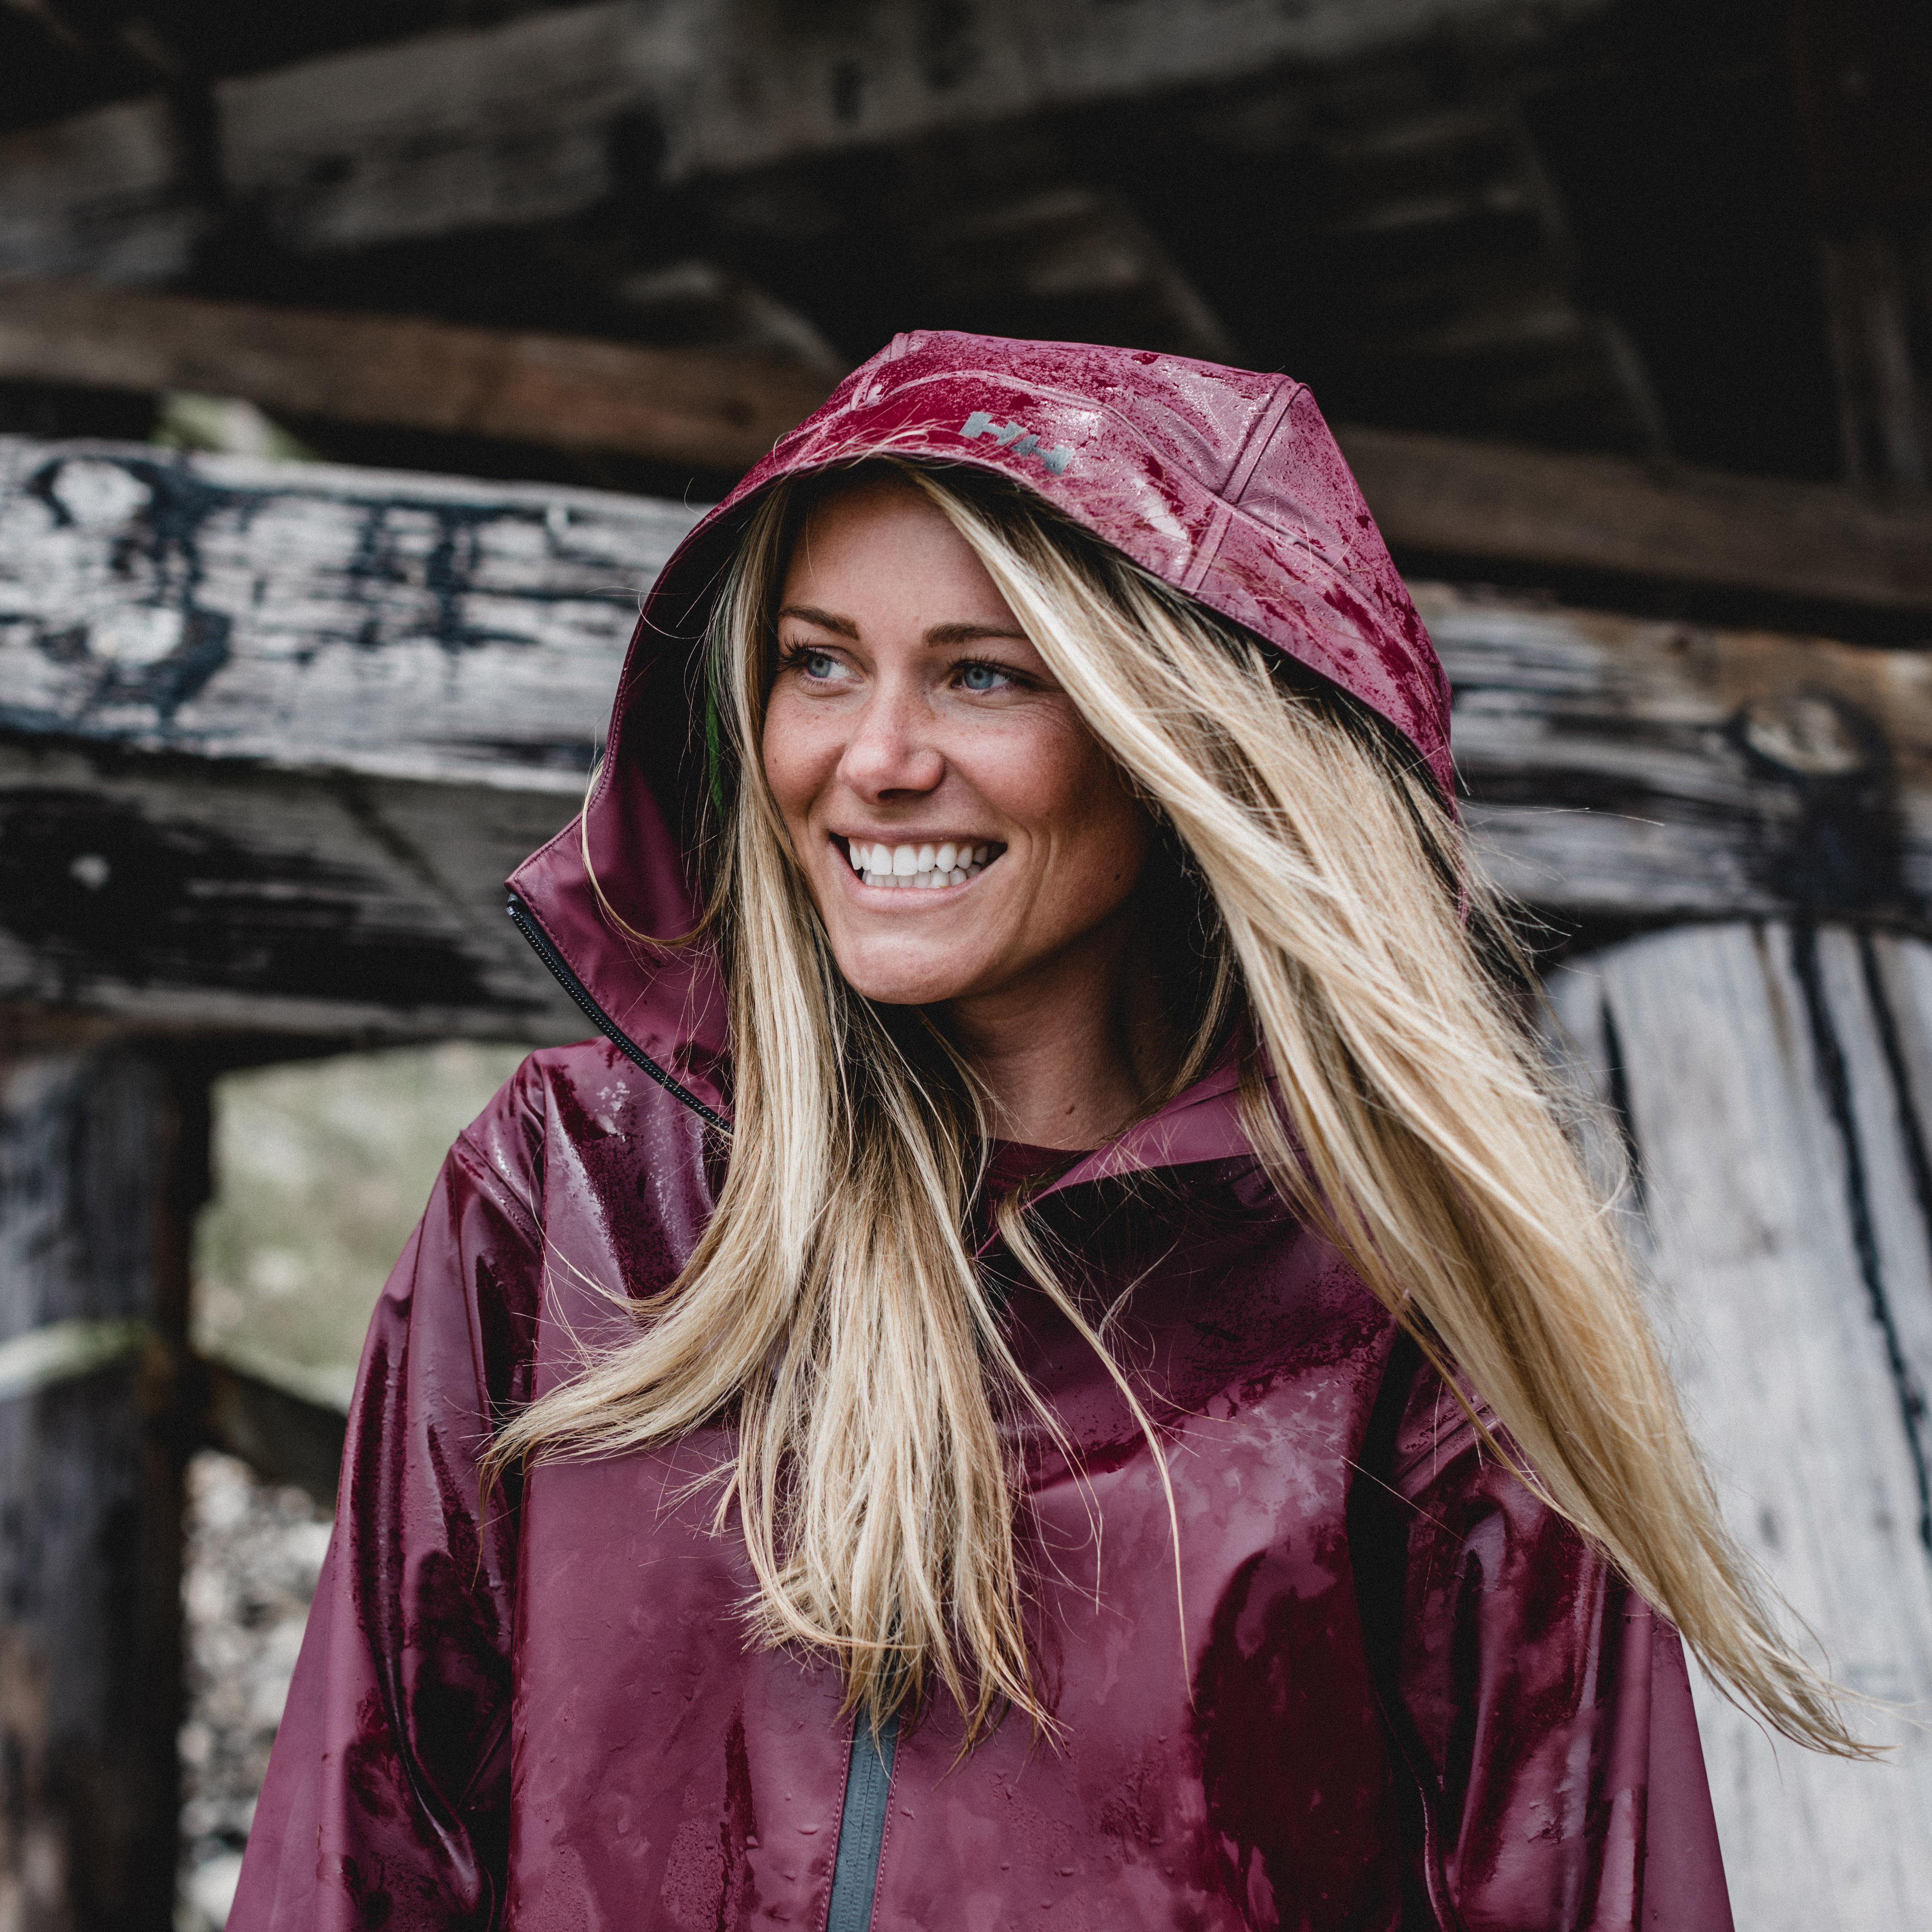 Amazon.com: Helly Hansen Copenhague Raincoat: Clothing